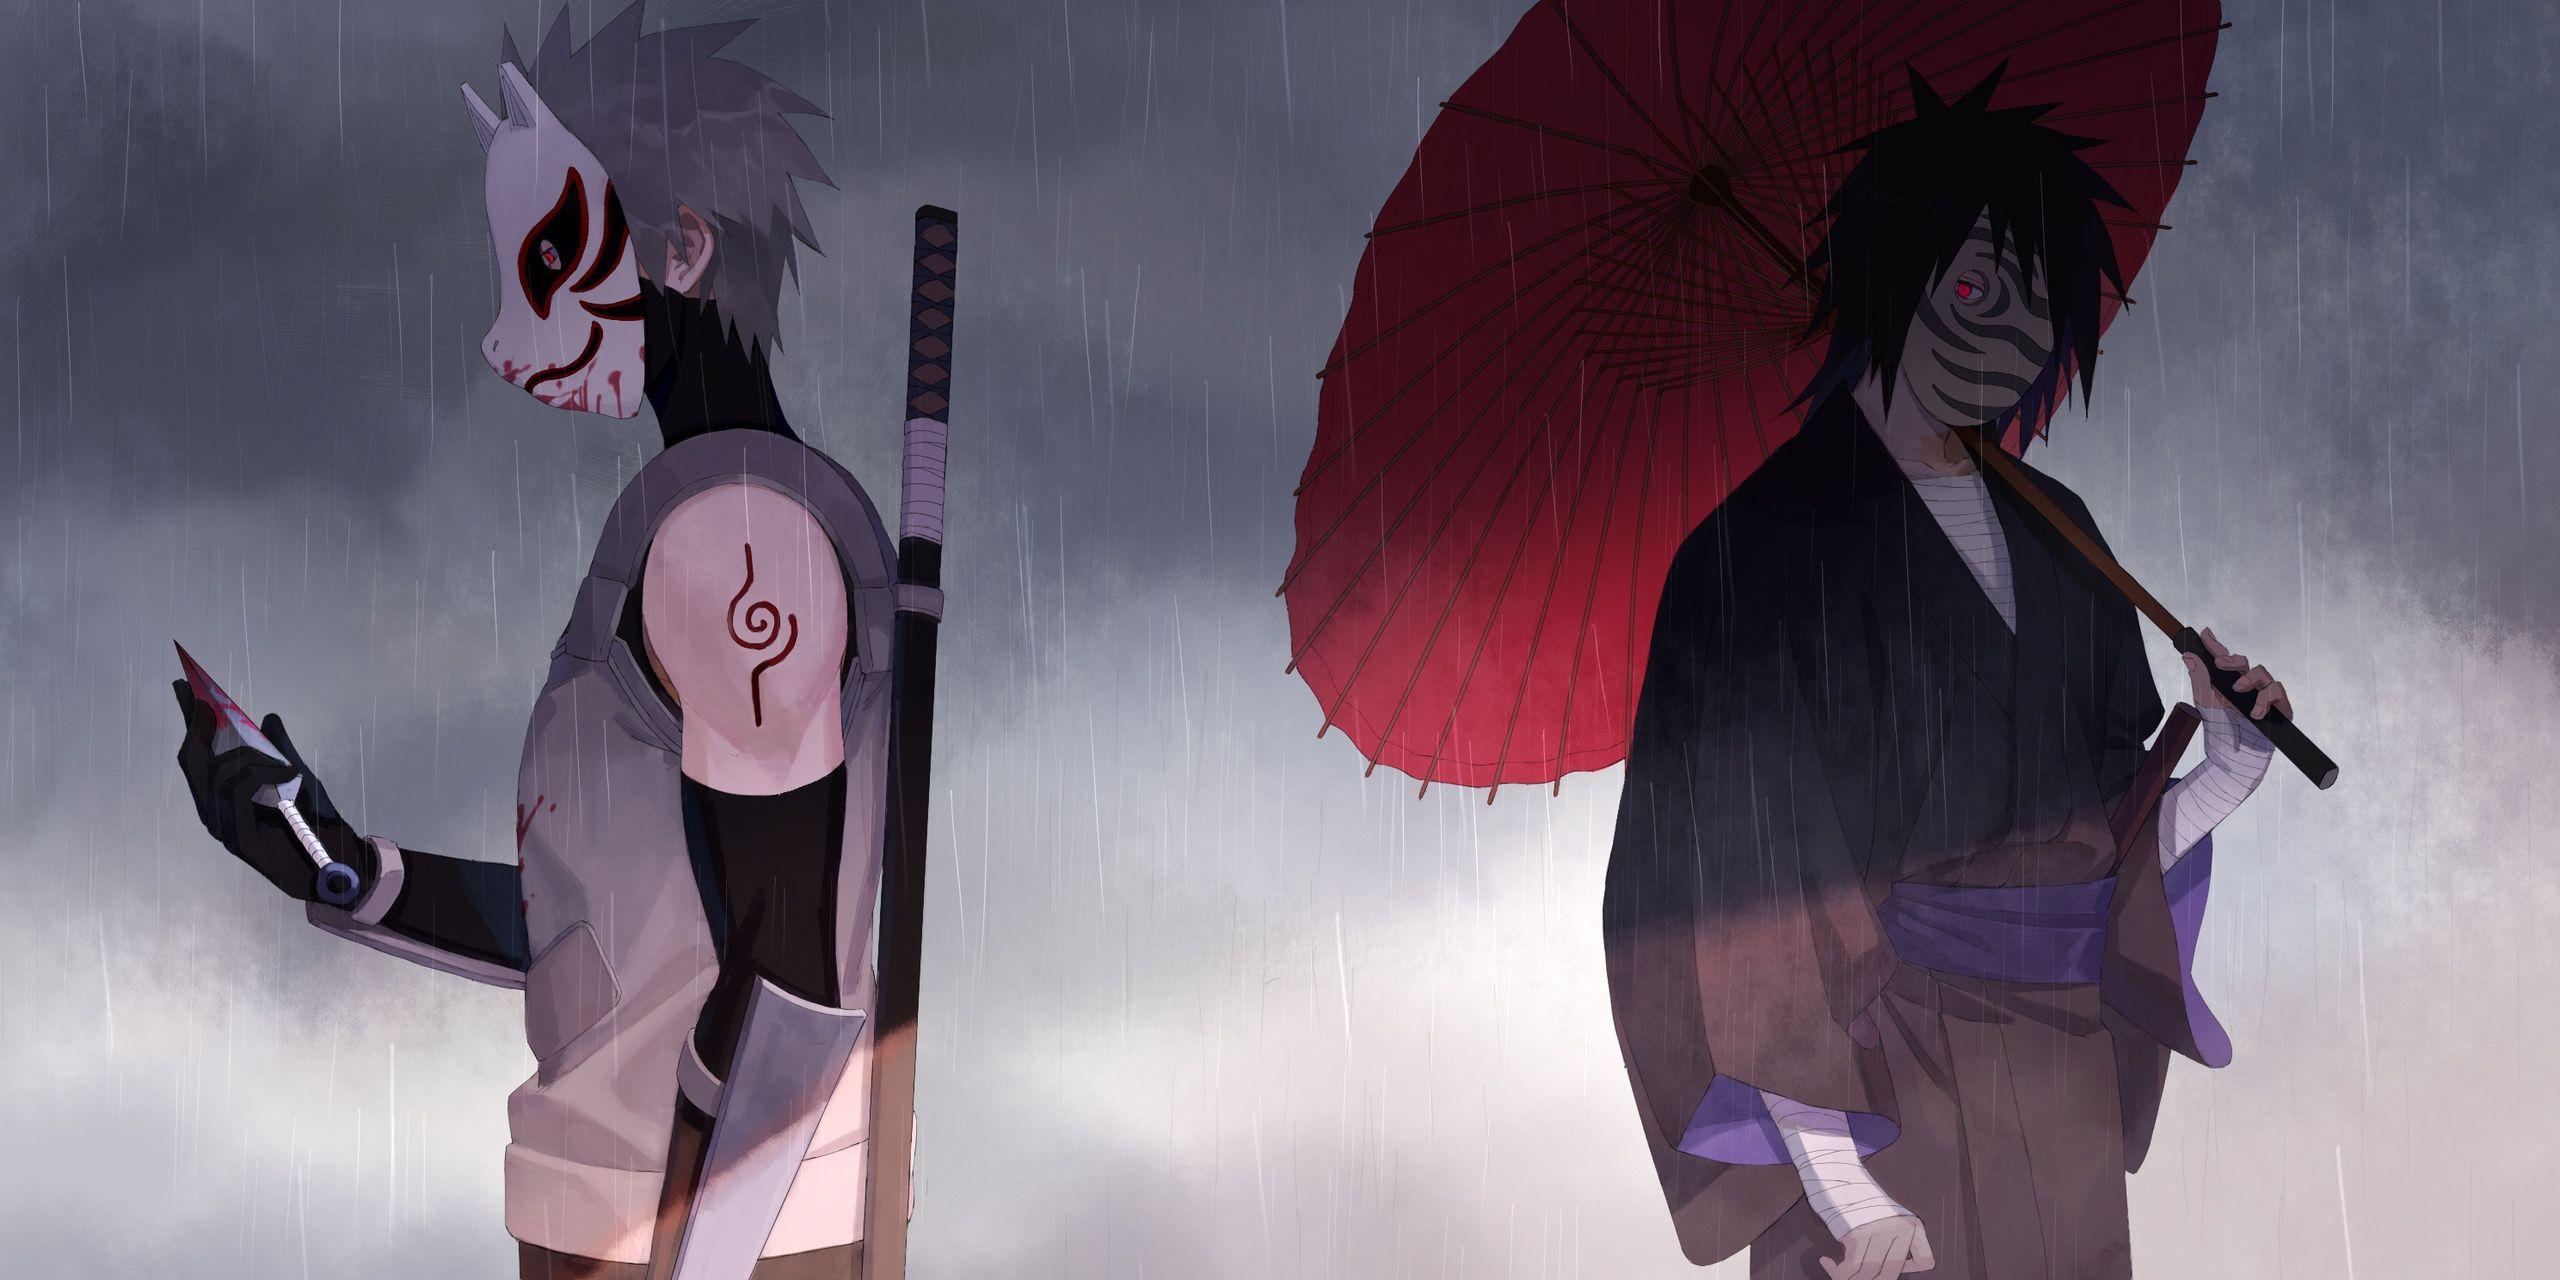 Wallpaper Engine In 2021 Anime Naruto Kakashi Anime Anime wallpaper engine non steam